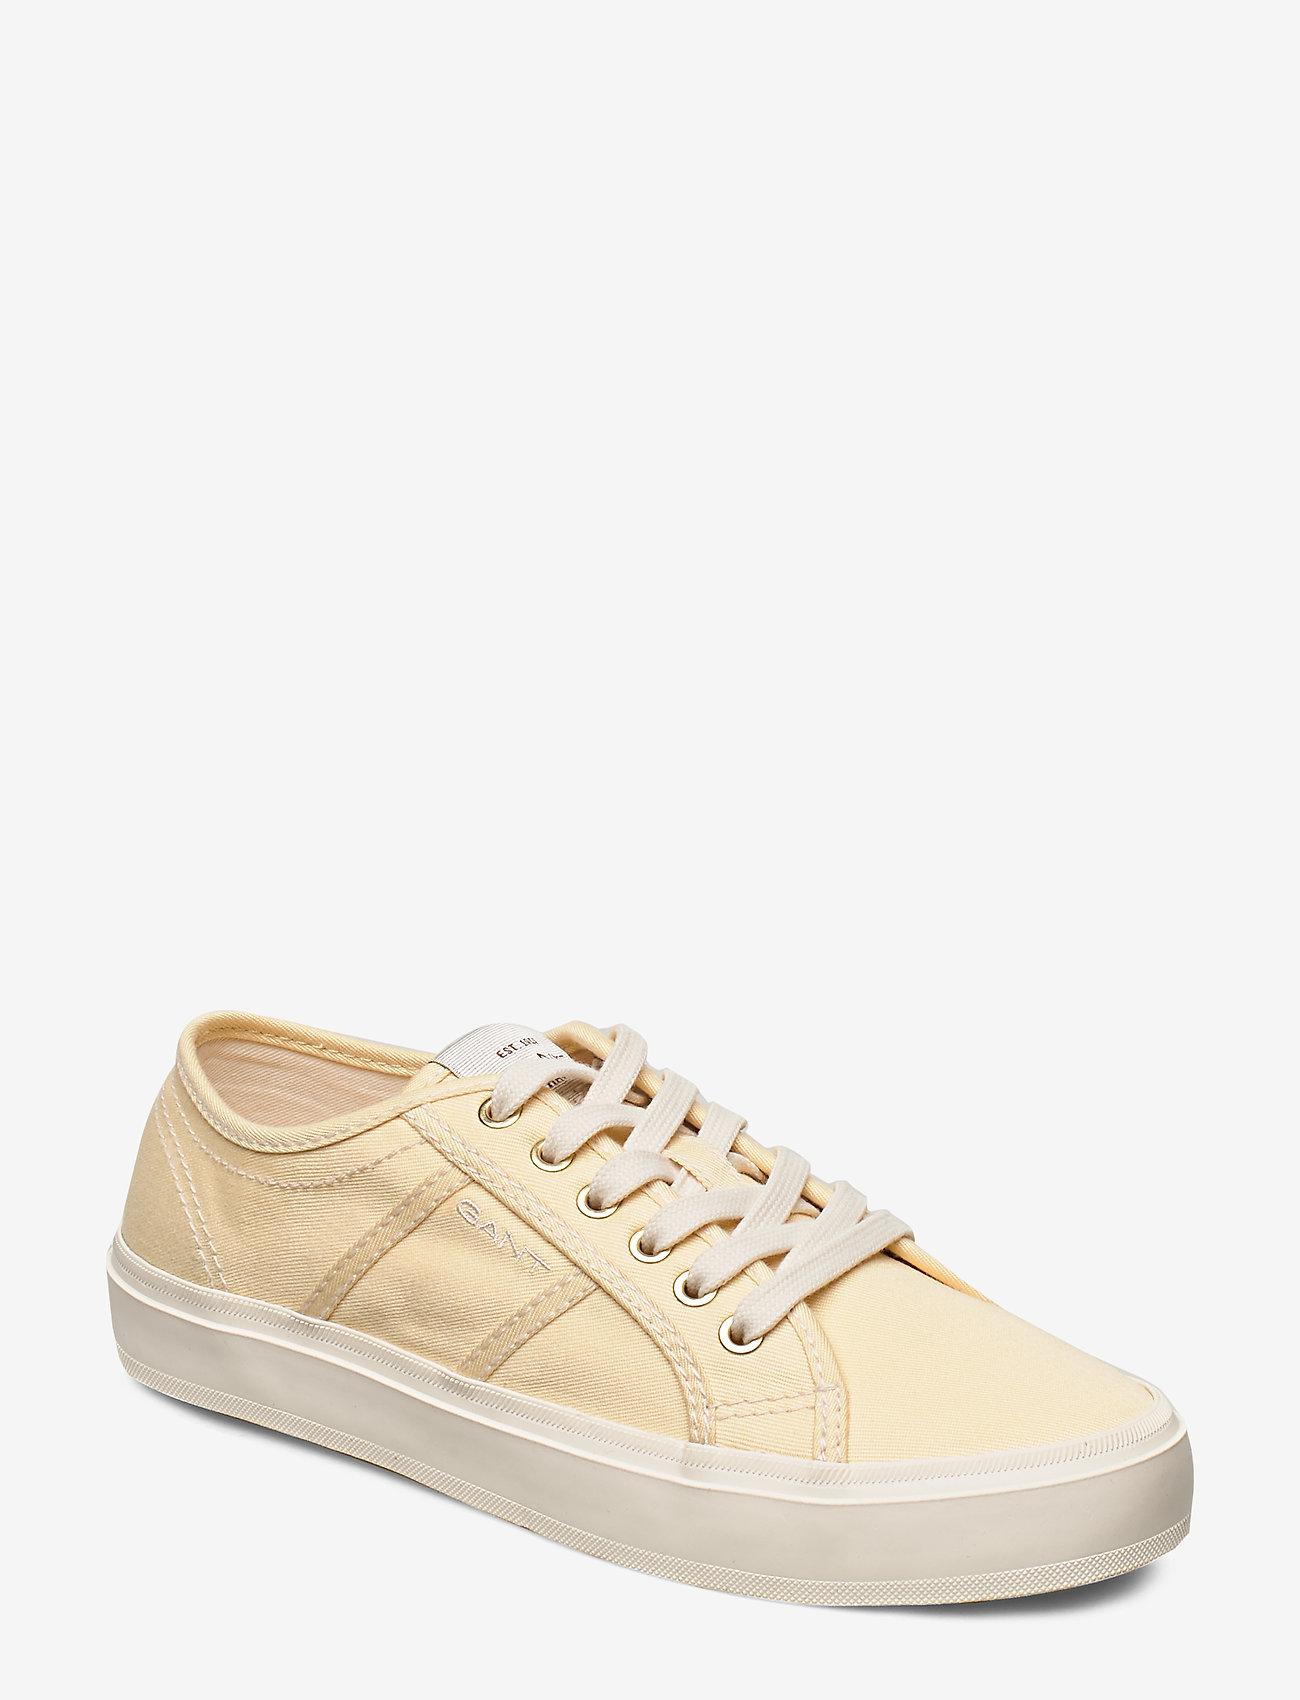 GANT - Pinestreet Low laceshoes - låga sneakers - light yellow